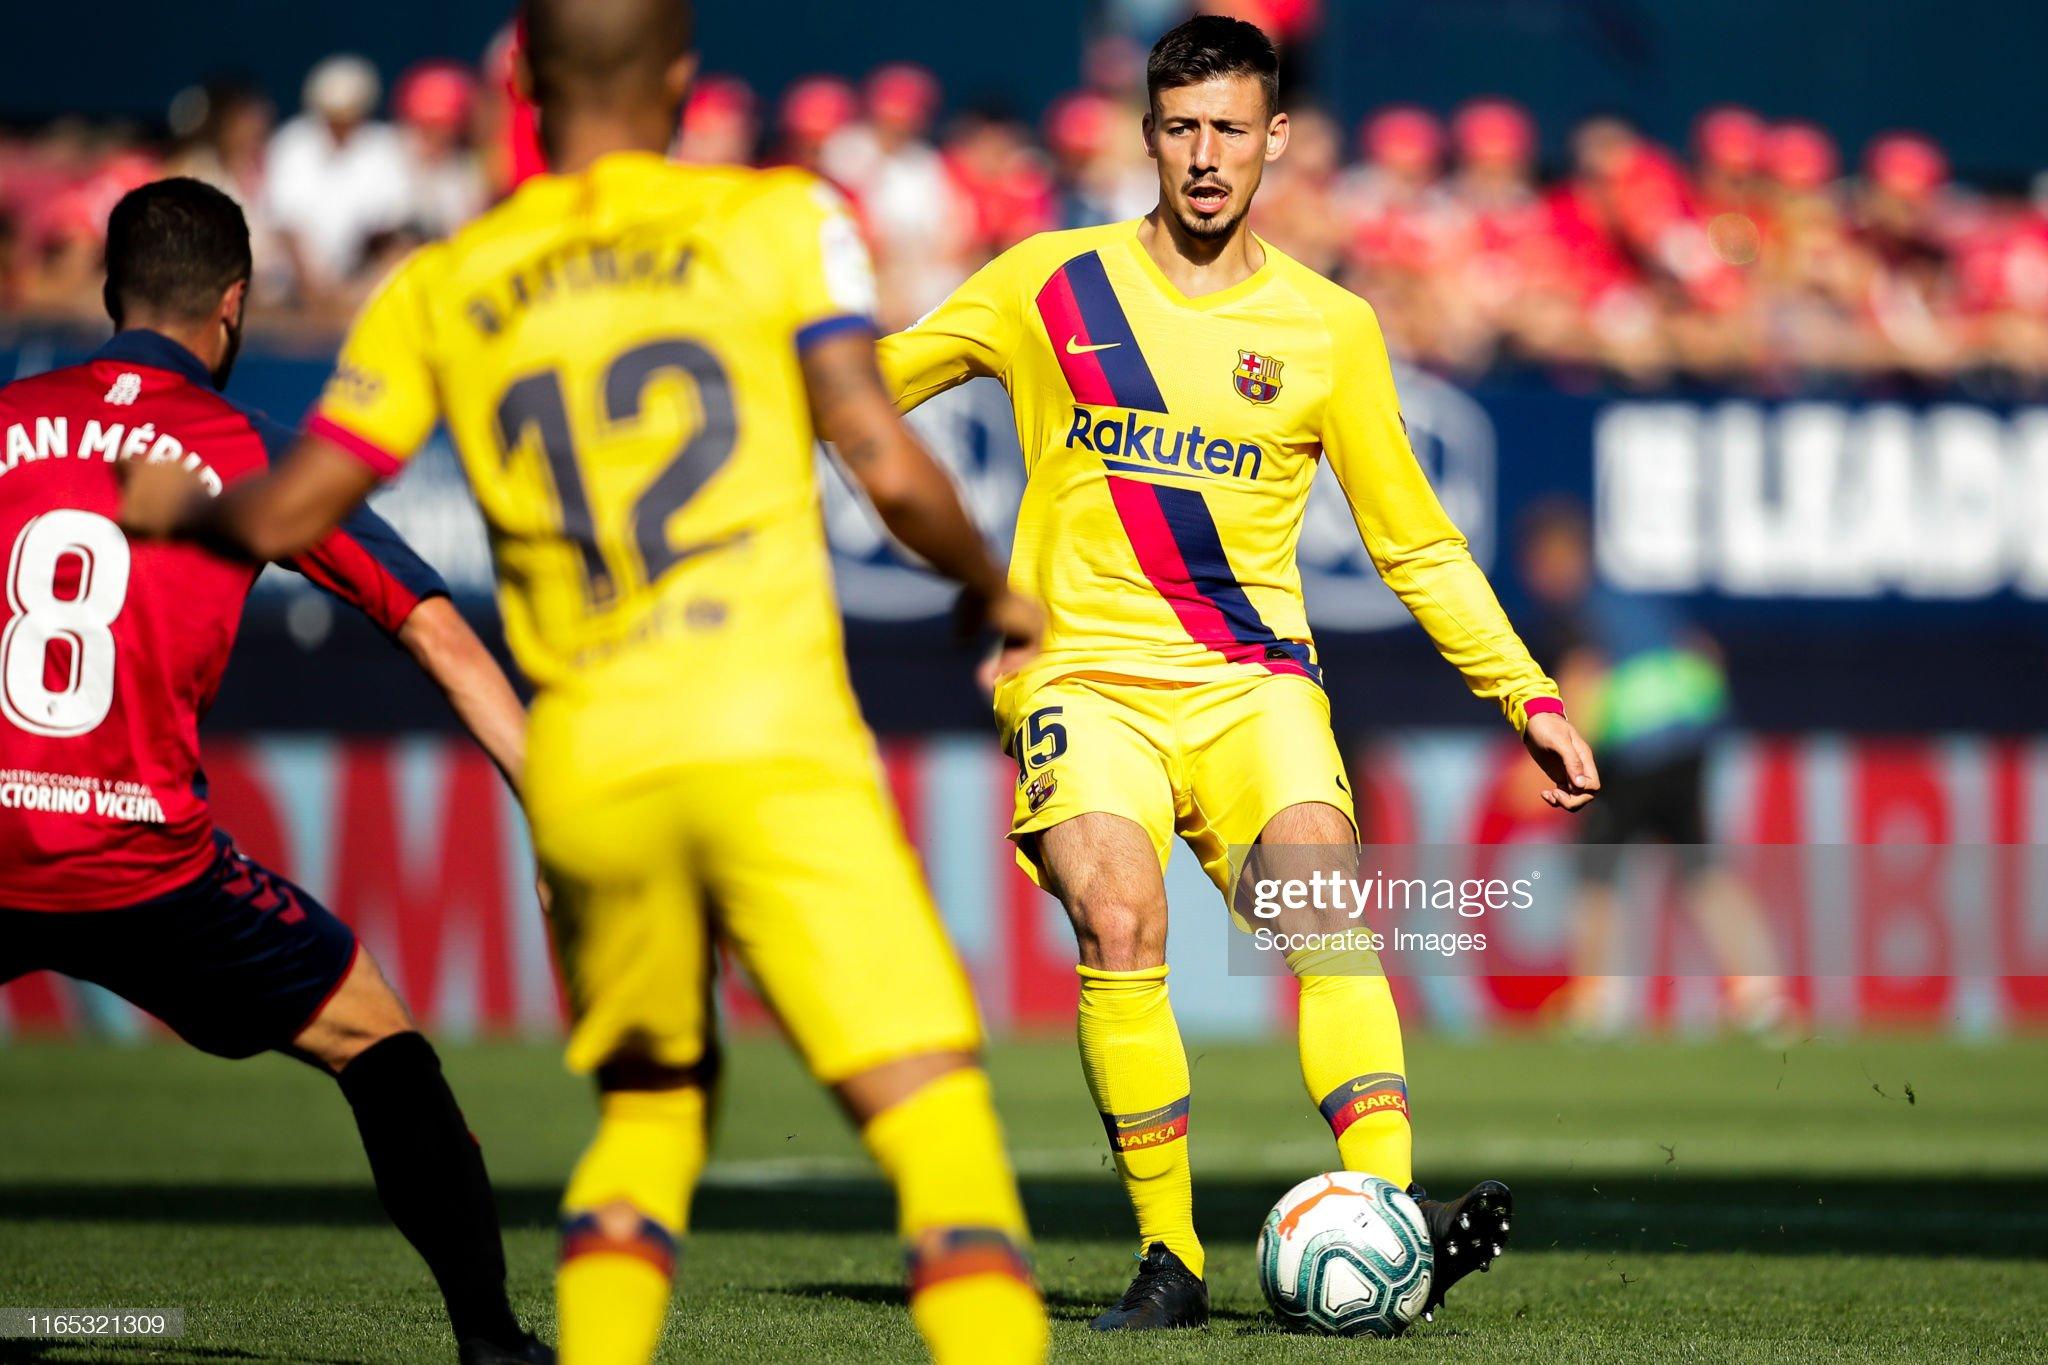 صور مباراة : أوساسونا - برشلونة 2-2 ( 31-08-2019 )  Clement-lenglet-of-fc-barcelona-during-the-la-liga-santander-match-picture-id1165321309?s=2048x2048